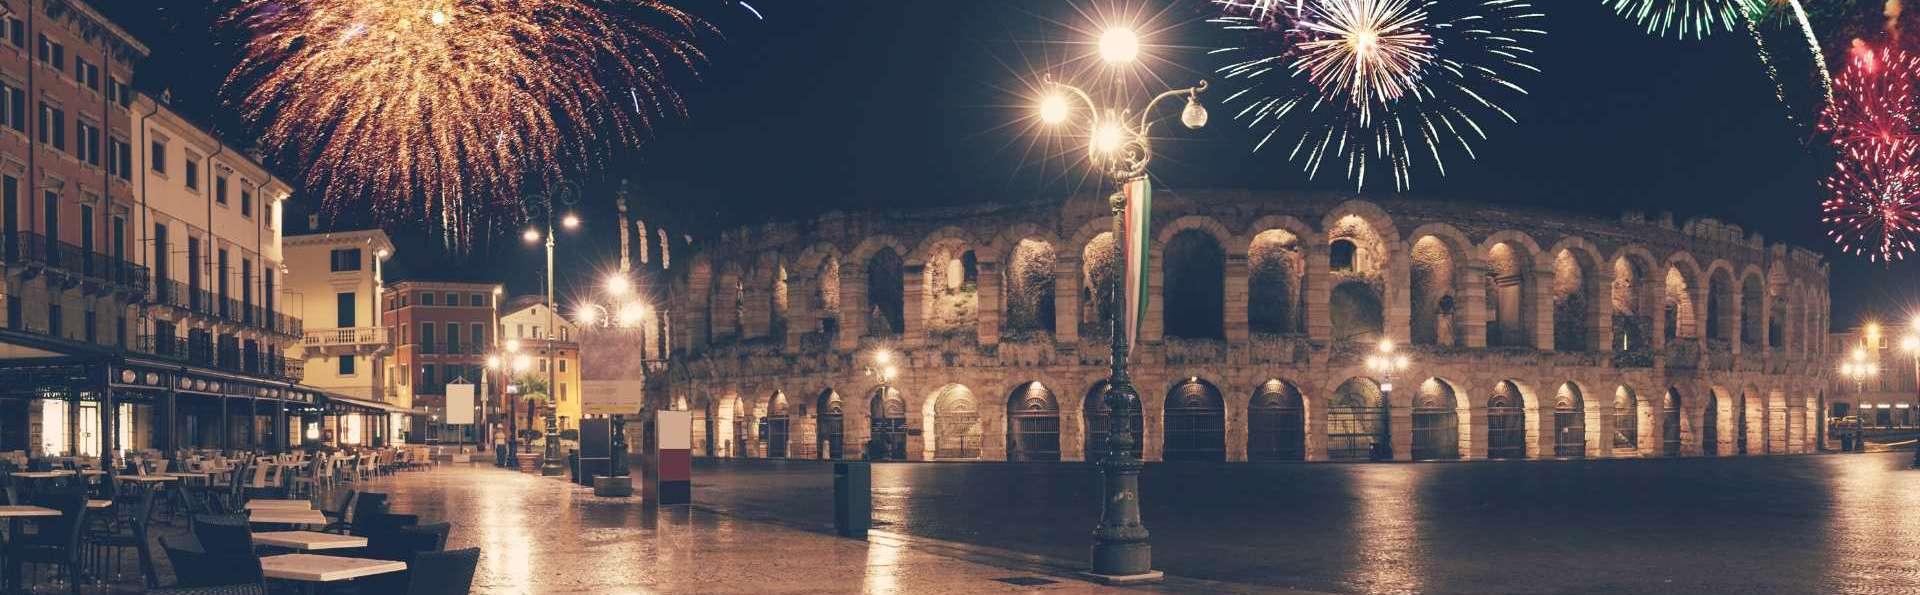 Hotel Antares - EDIT_Verona_NYE.jpg